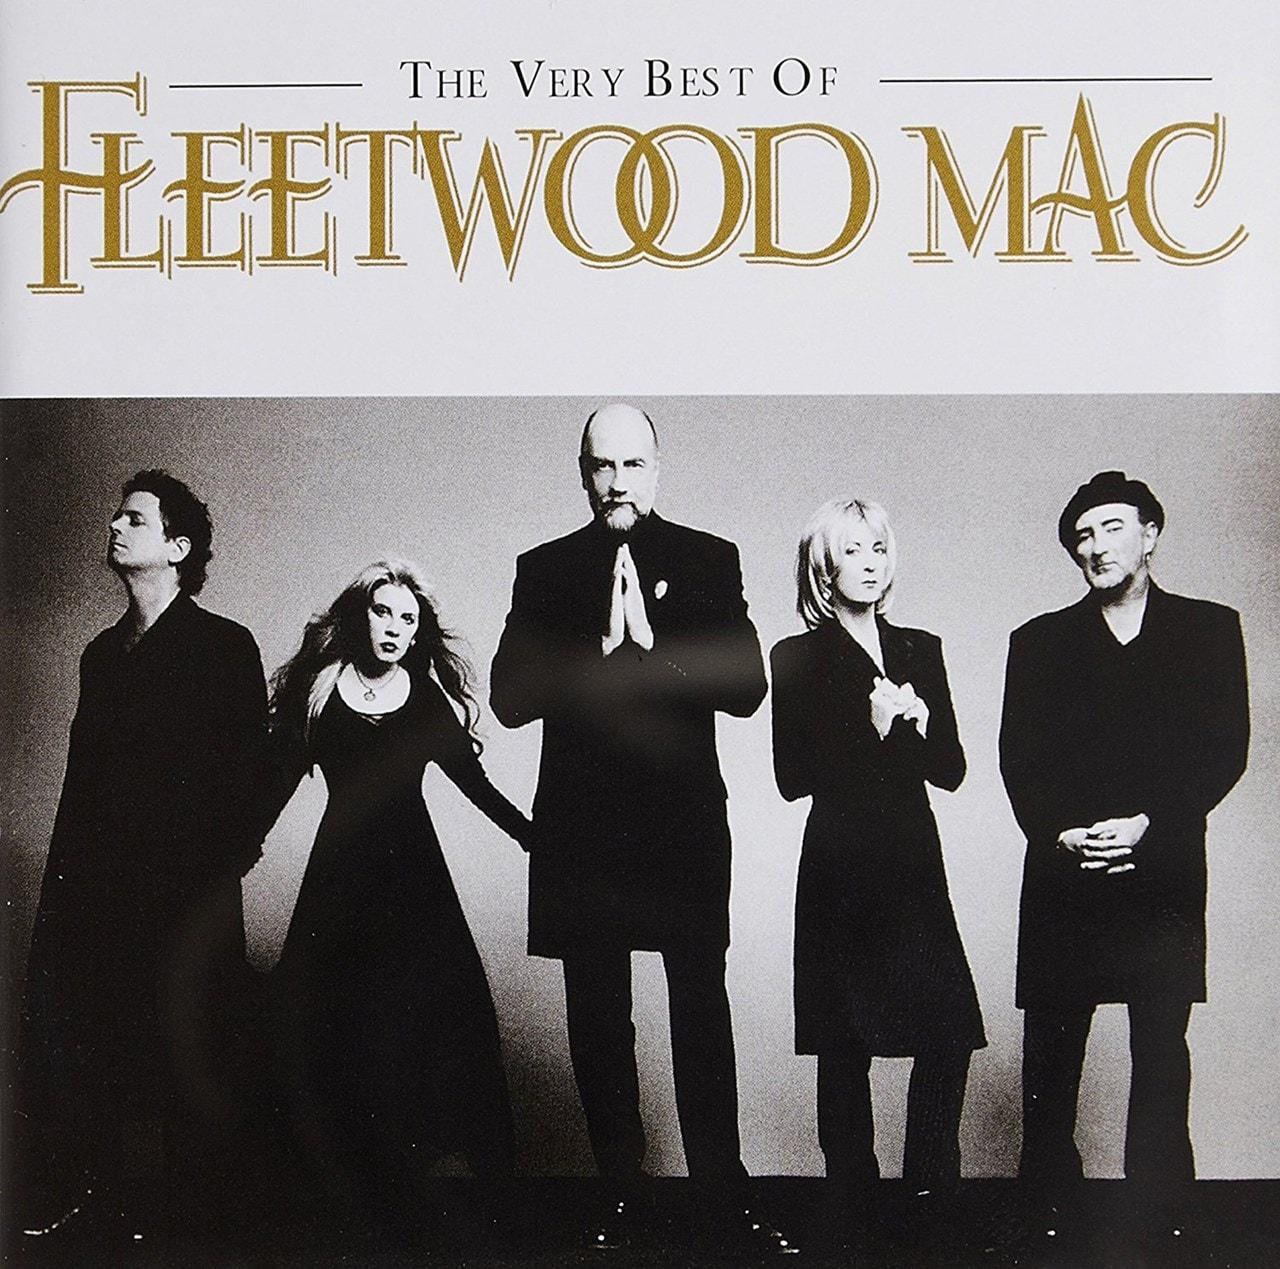 The Very Best of Fleetwood Mac - 1